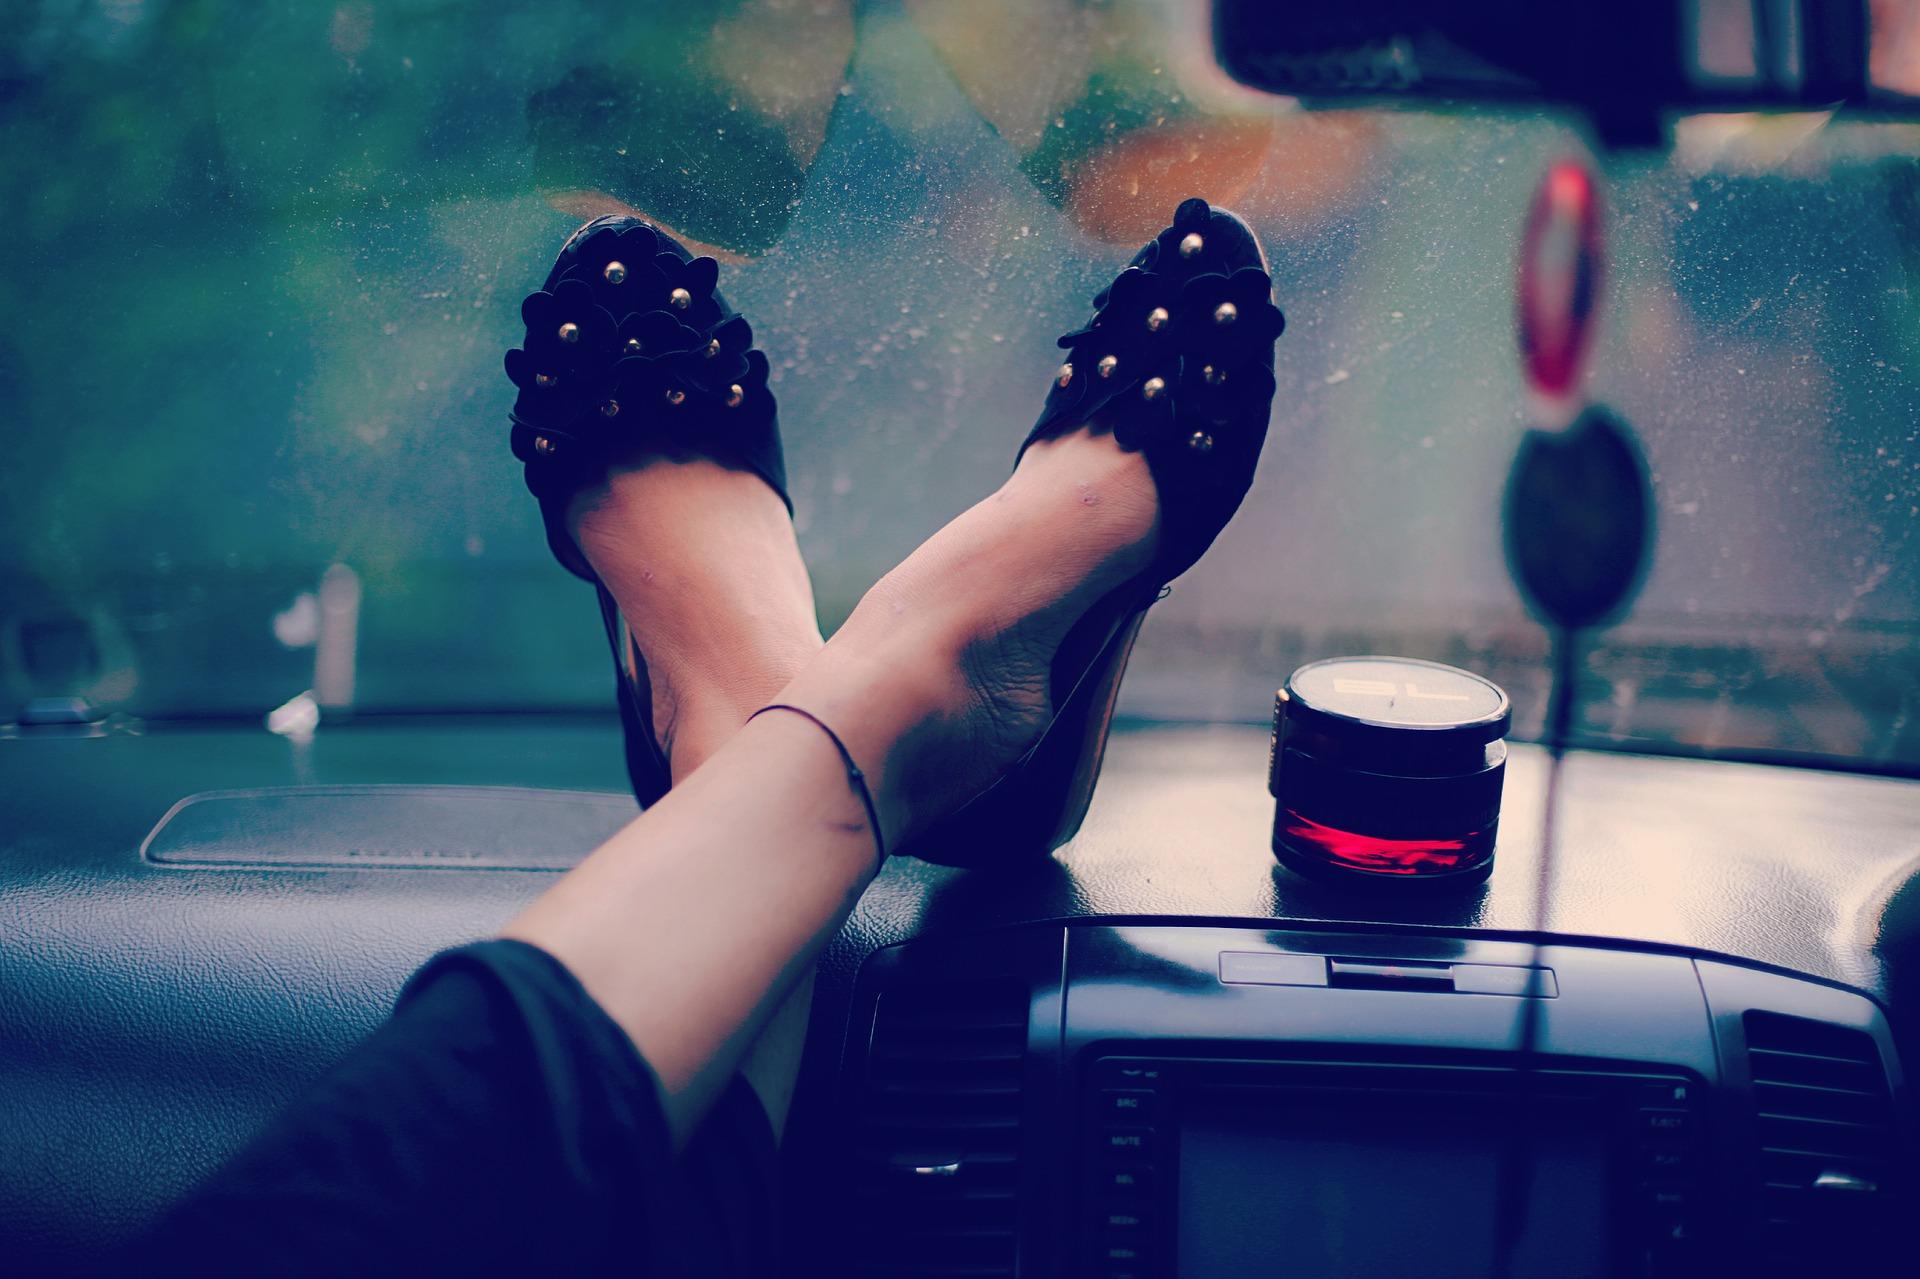 aa863544ca1 Τα καλύτερα και χειρότερα παπούτσια για τα πόδια μας - Ιατρικά Νέα